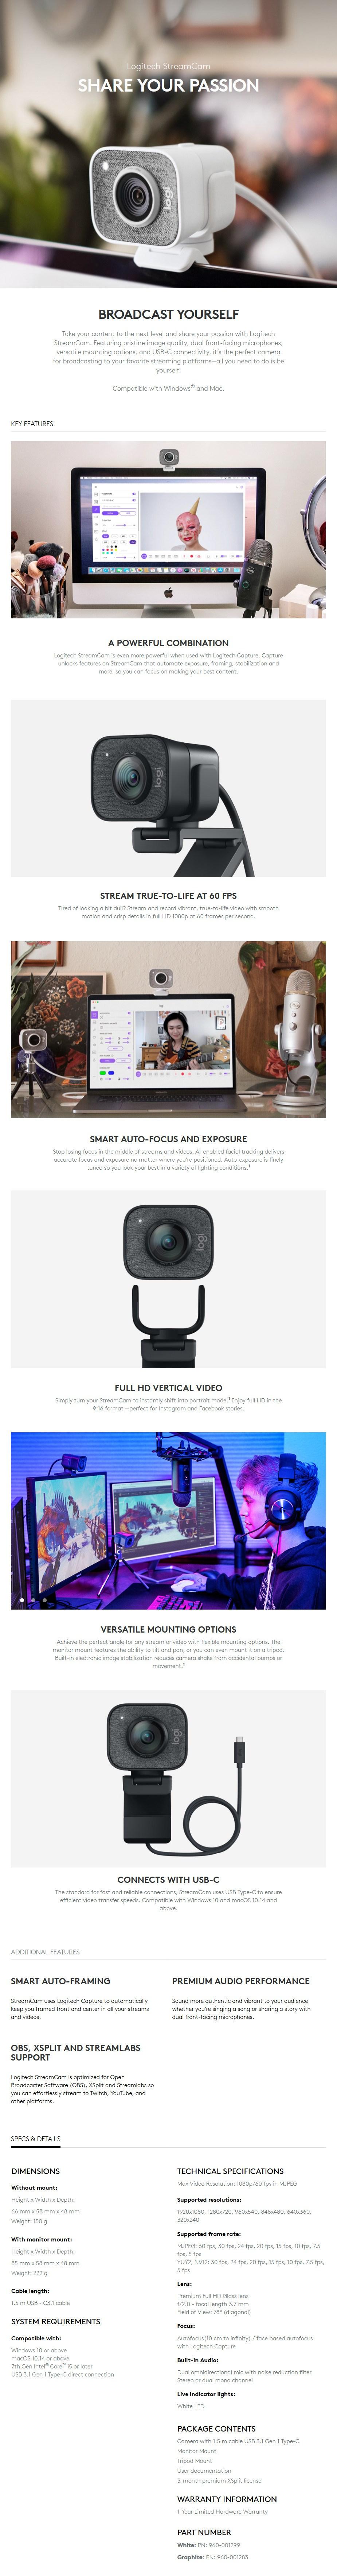 Logitech StreamCam Full HD USB-C Webcam - Graphite - Overview 1